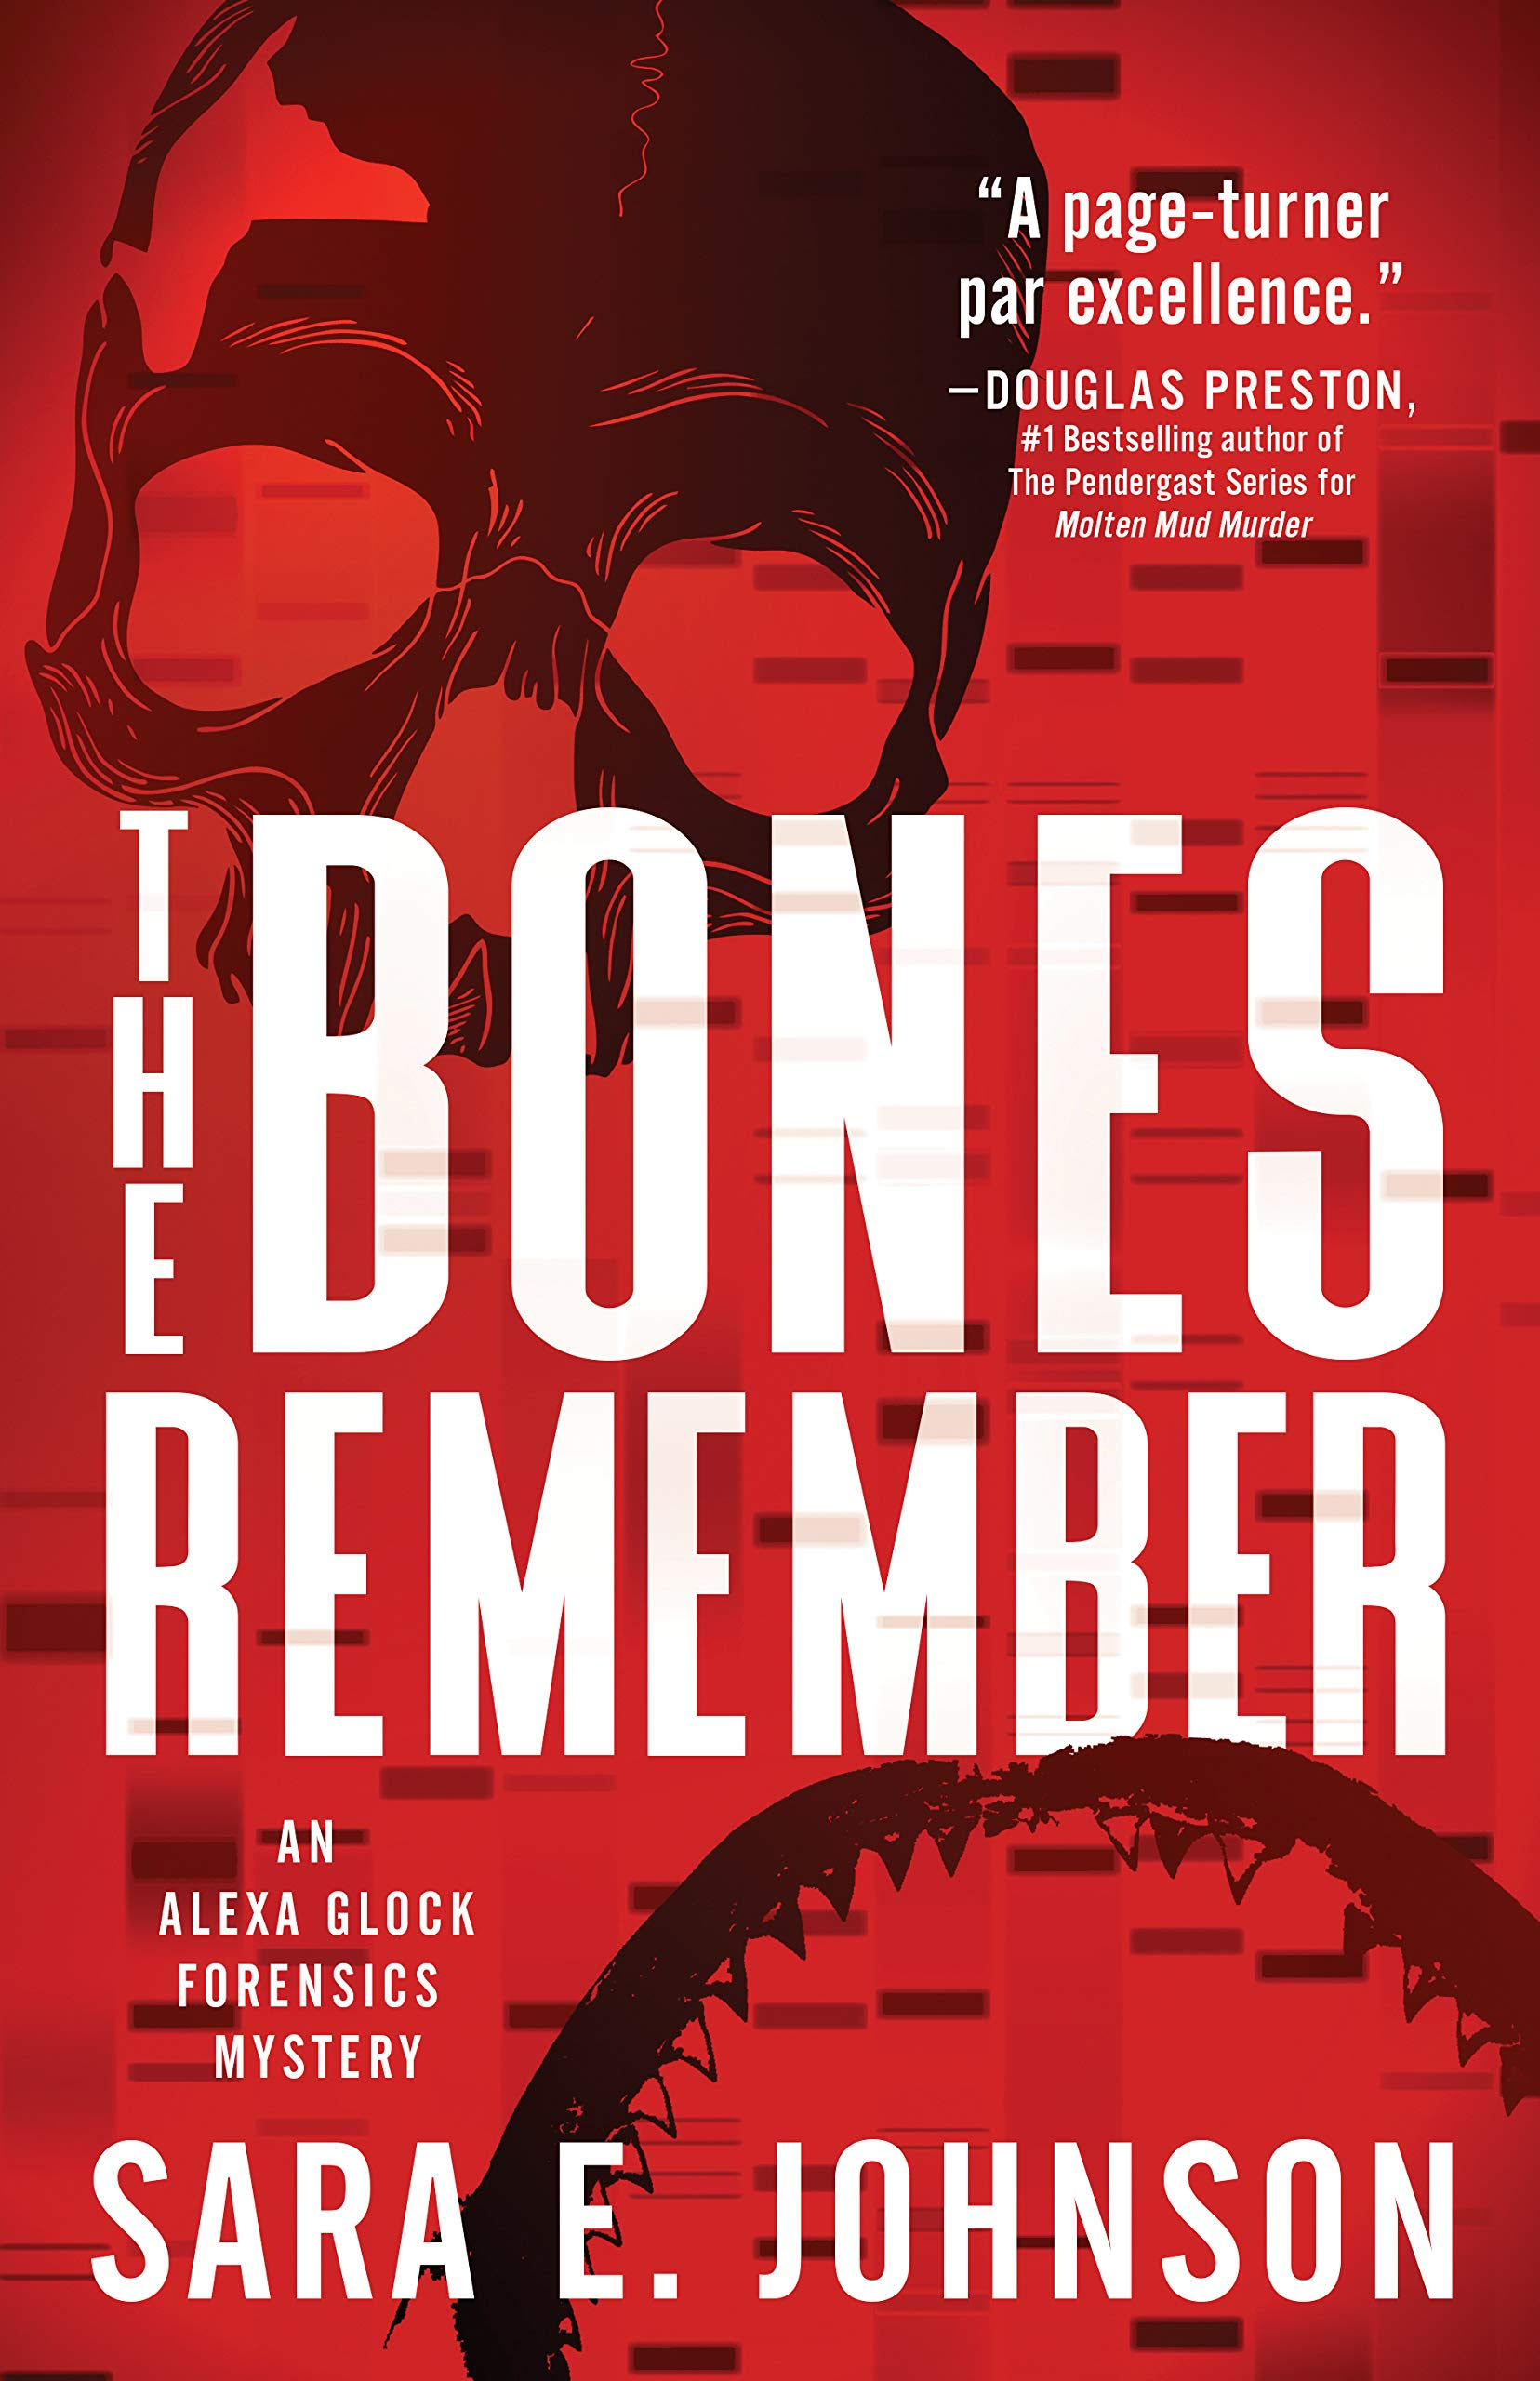 The Bones to Remember by Sara E. Johnson